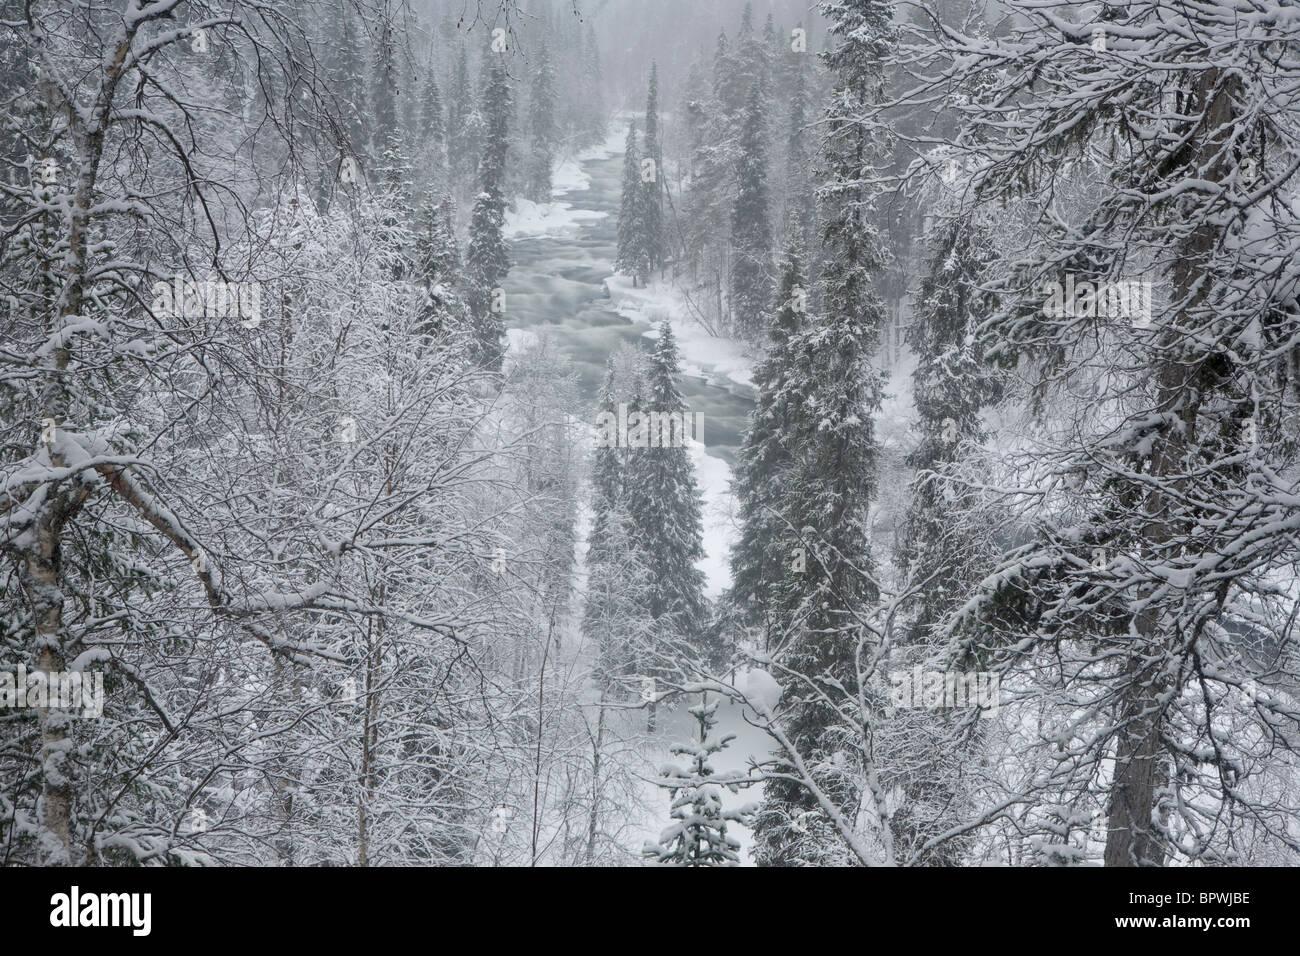 The Kitka River in Oulanka National Park, Finland. - Stock Image